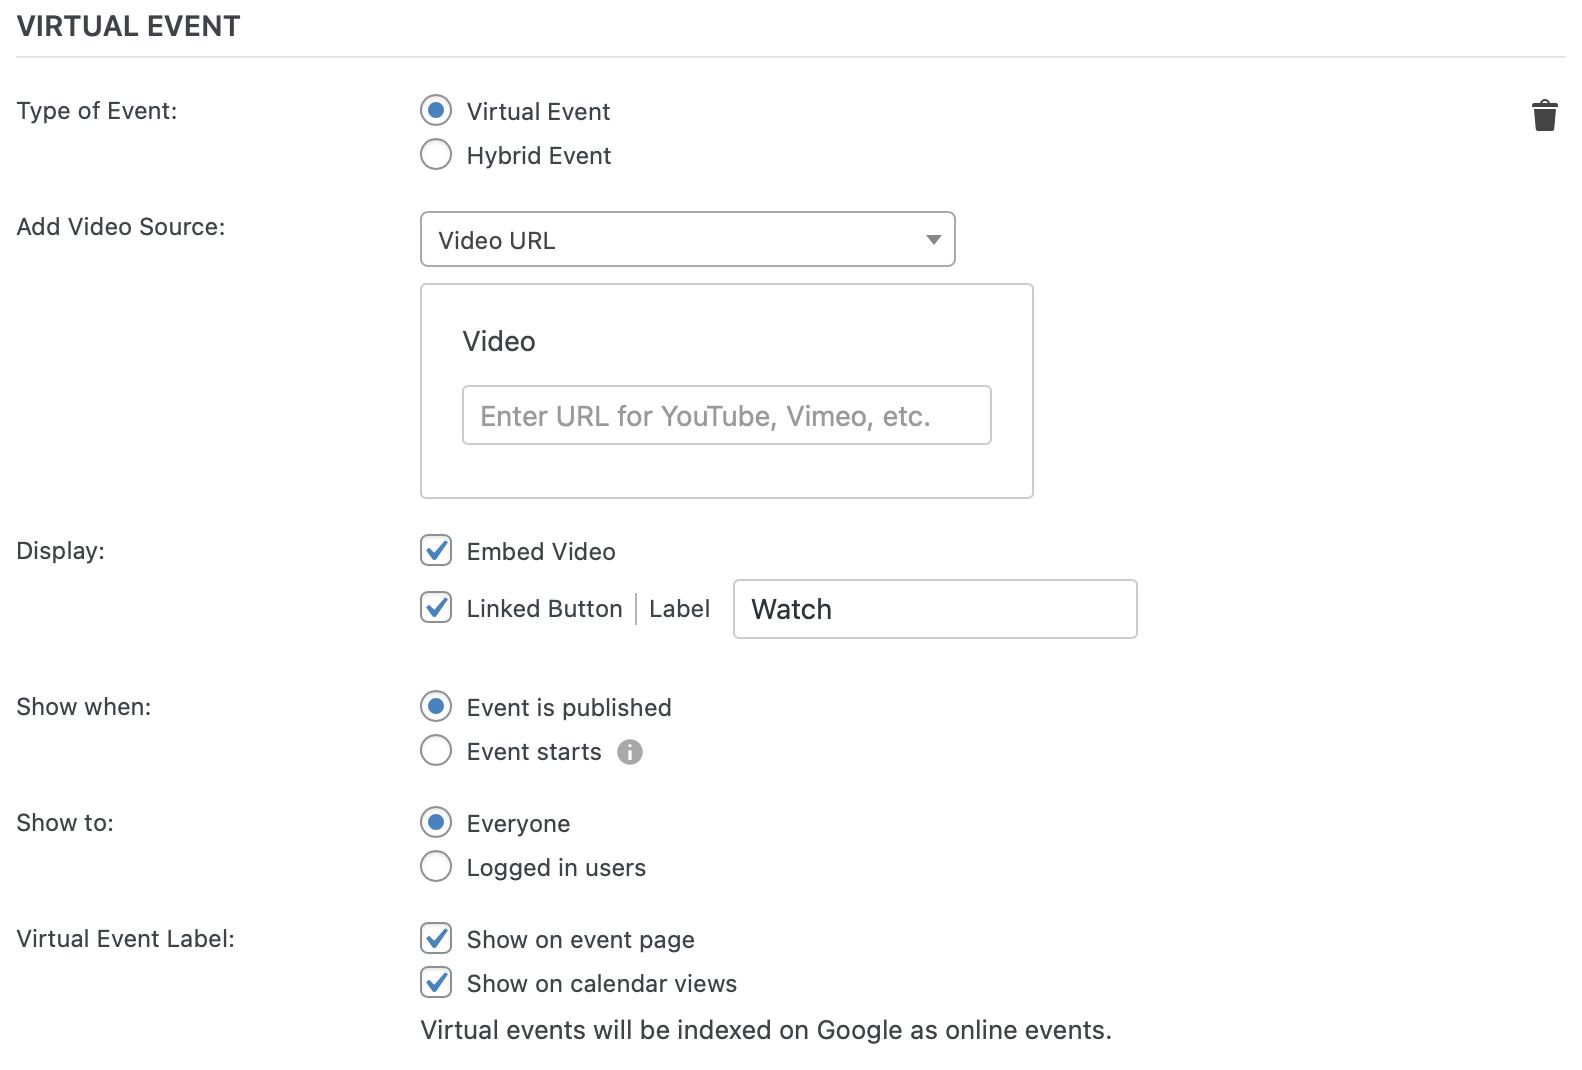 Configure Virtual Events page